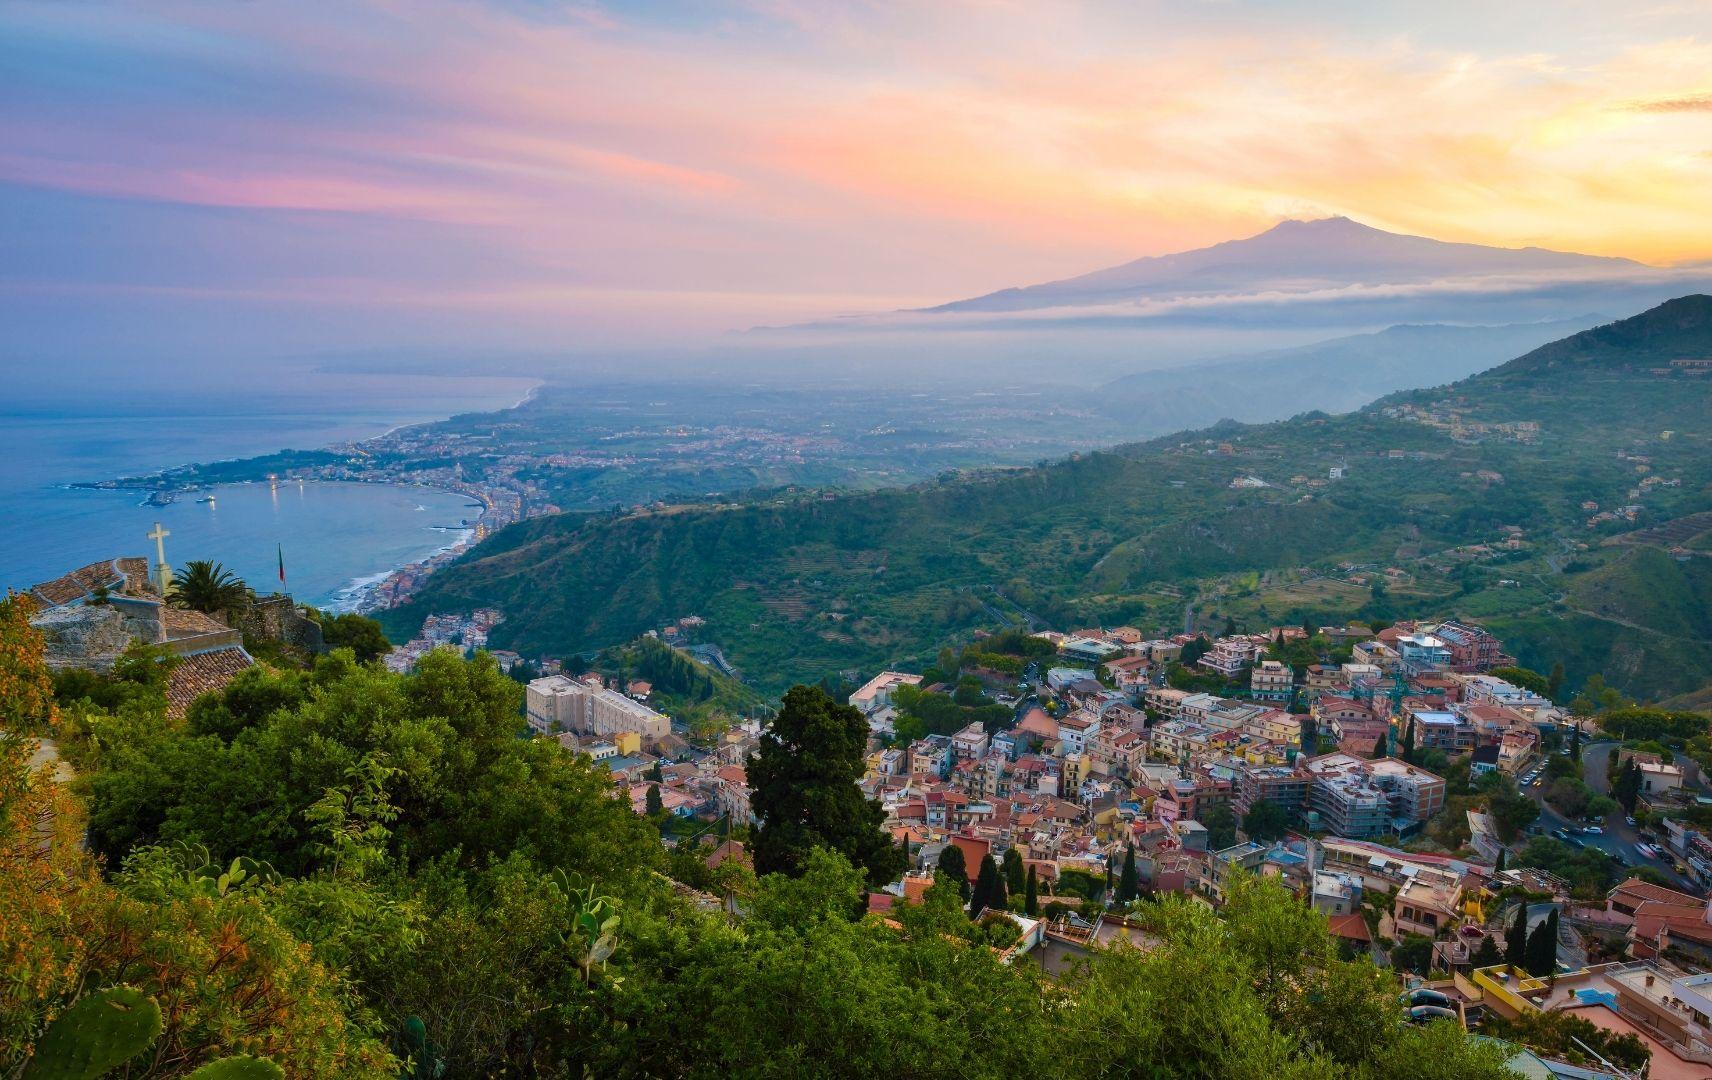 Italien - Sizilien Landschaft